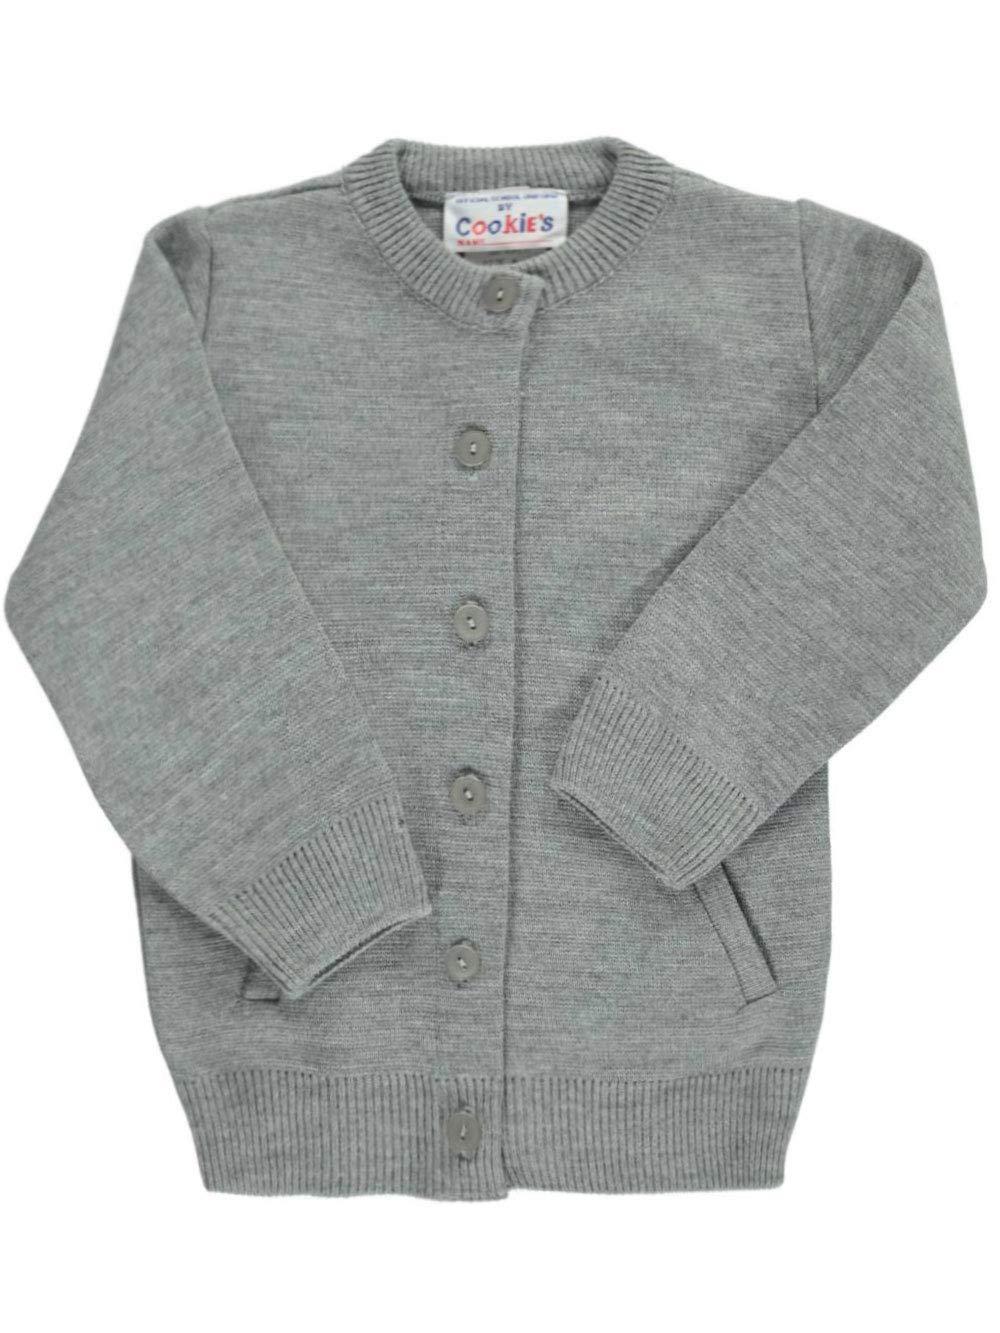 Cookie's Brand Big Girls' Crewneck Cardigan Sweater - Gray, 10 by Cookie's Kids (Image #1)